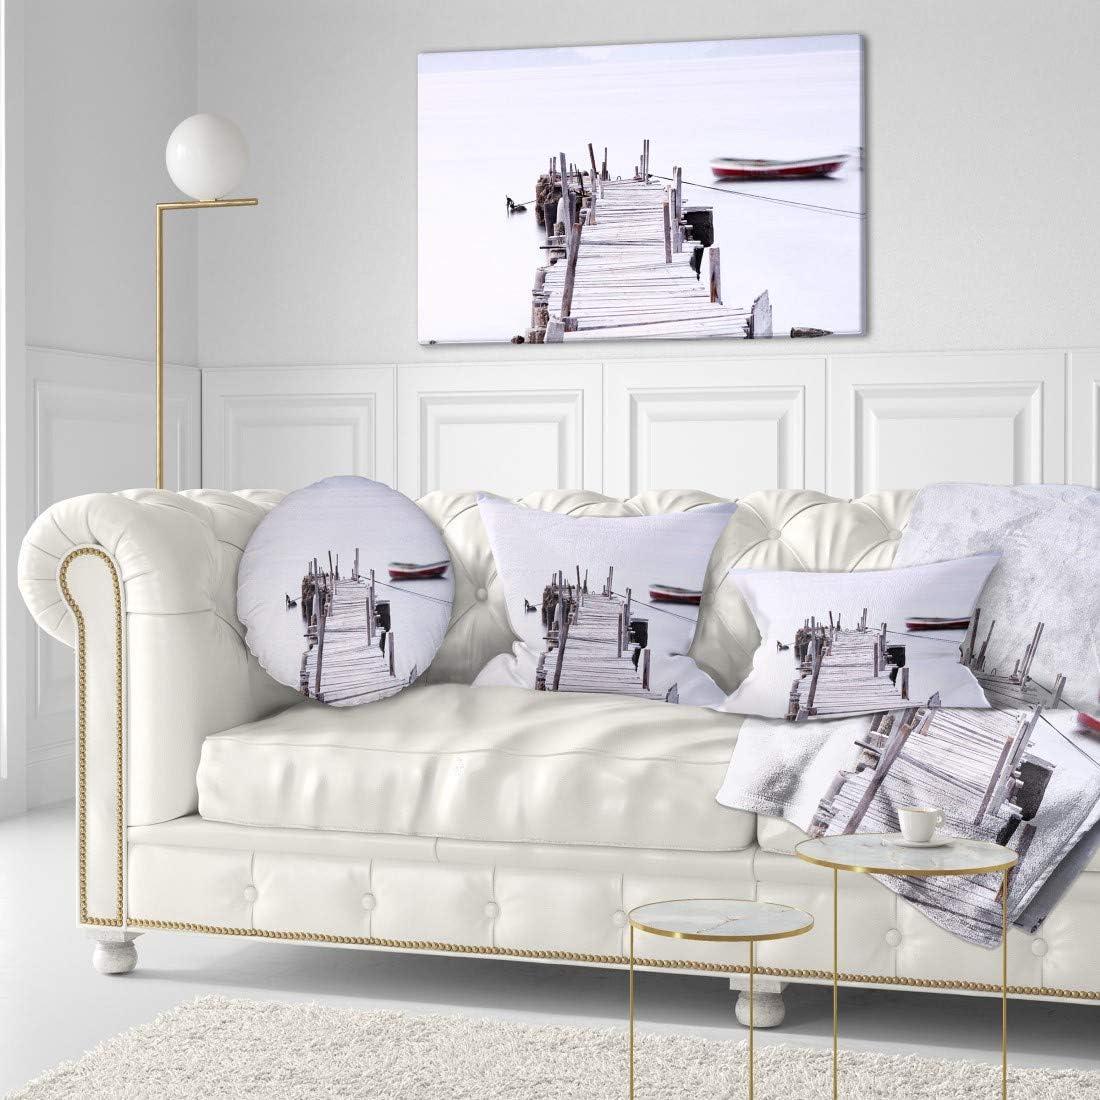 Amazon Com Designart Pt8403 40 20 Foggy Sea With Pier And Boats Seascape Photo Canvas Print 40x20 40x20 Blue Posters Prints